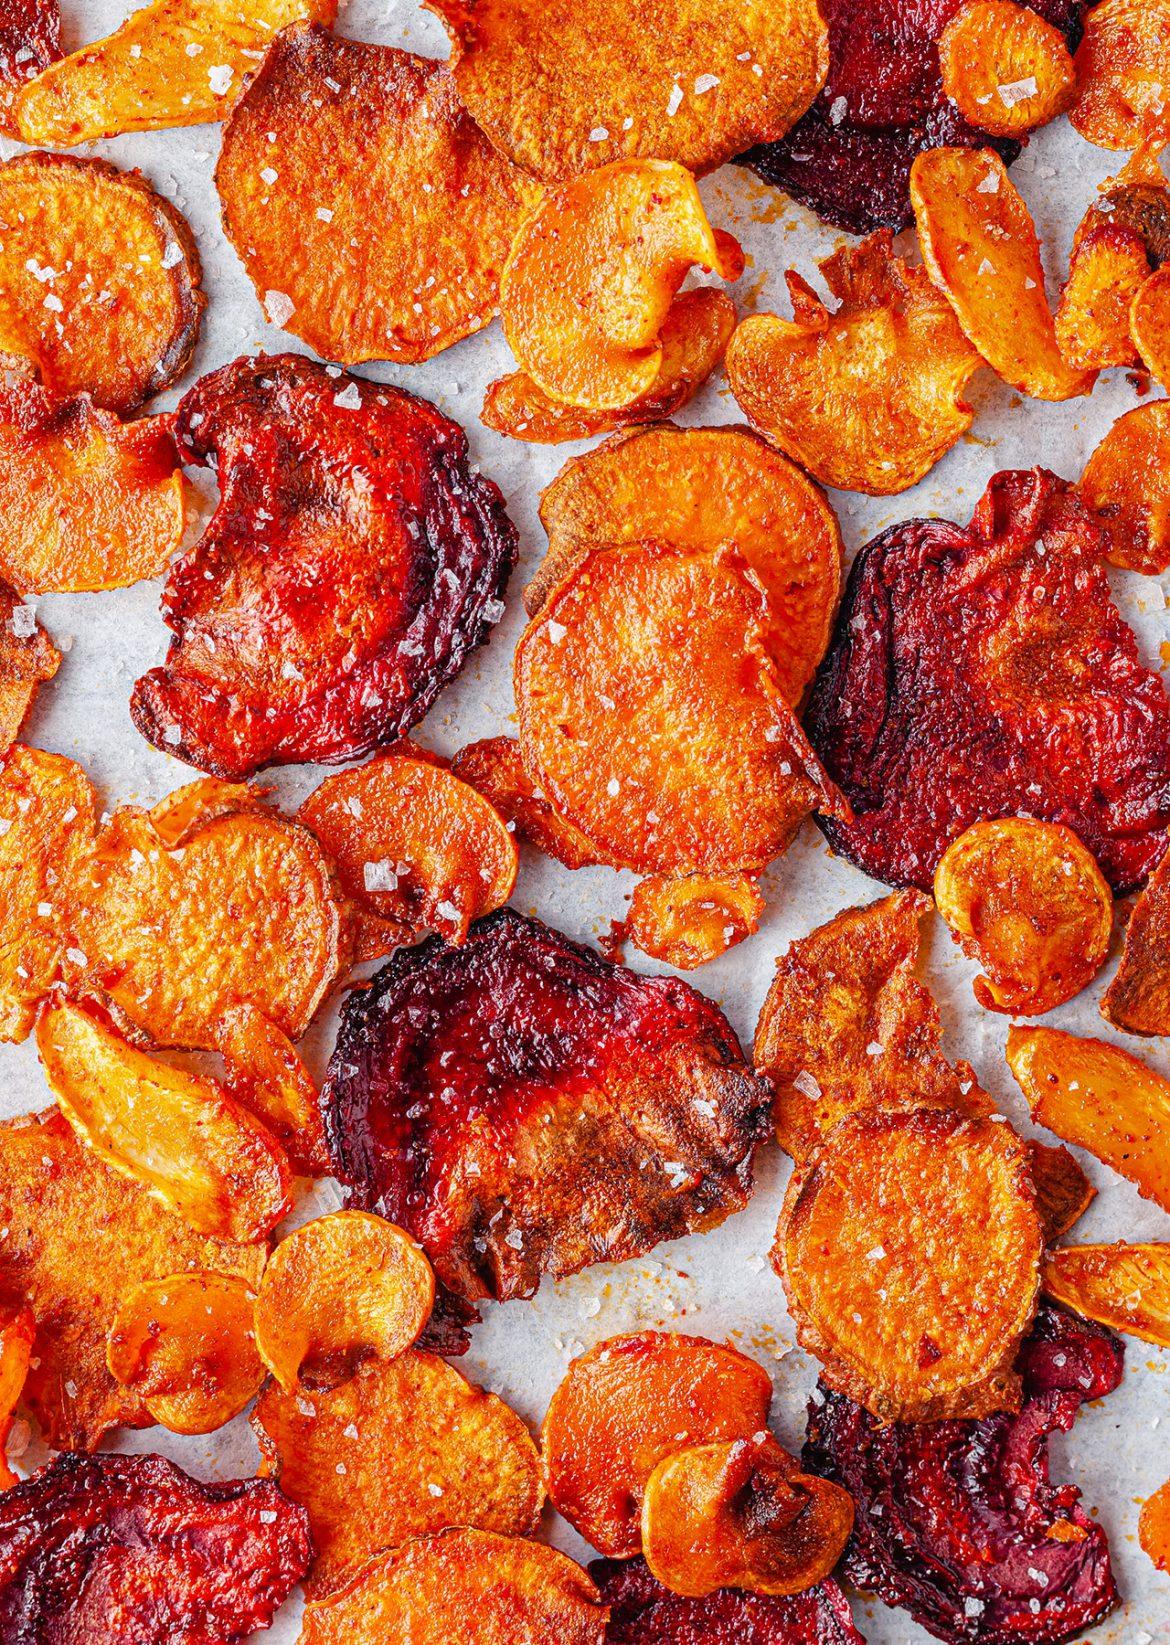 Vegan Vegetable Crisps Recipe